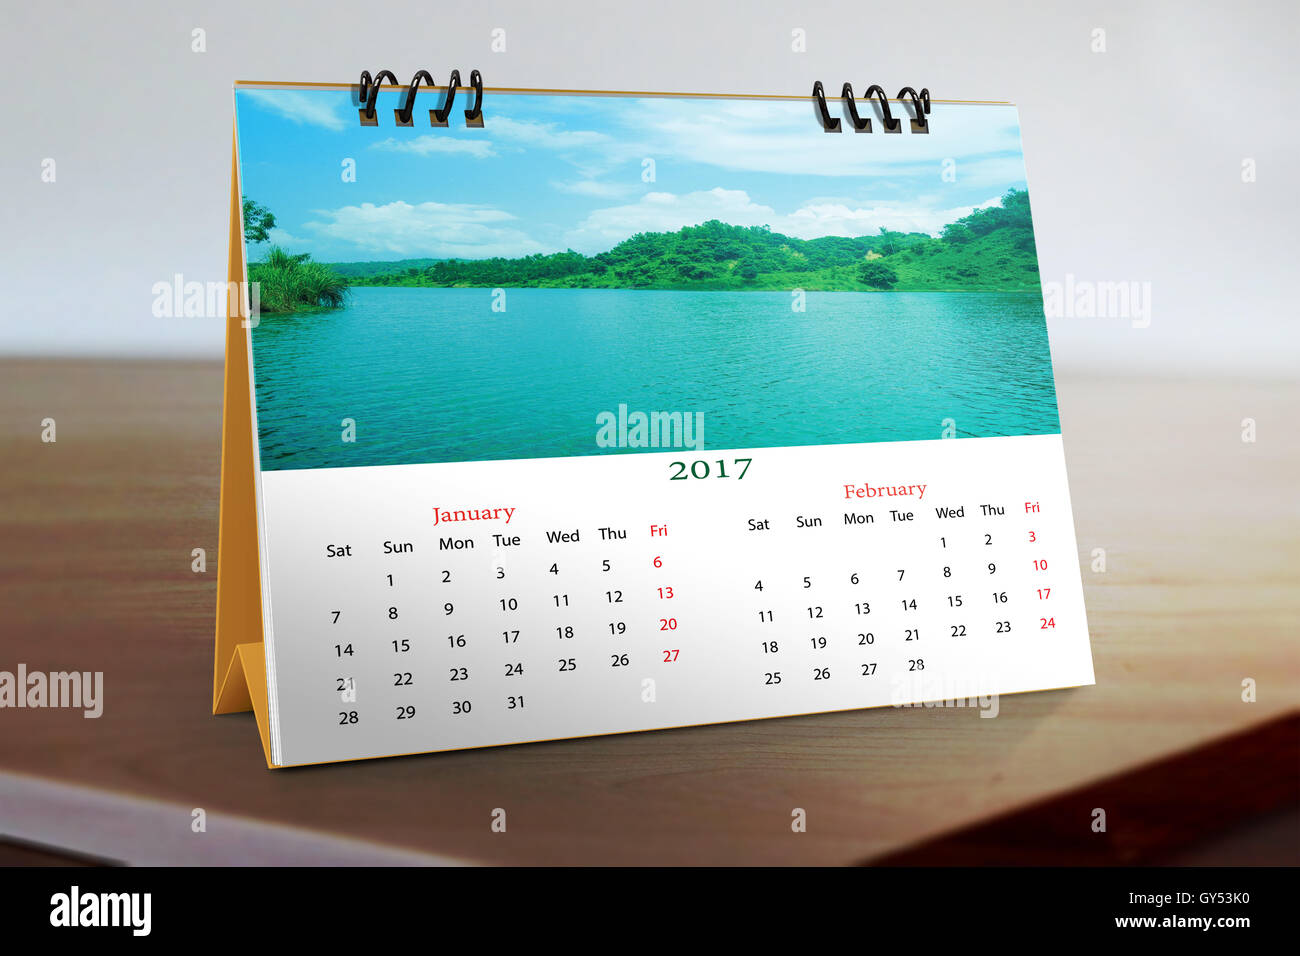 Calendar Layout Design : Desktop calendar design stock photo royalty free image